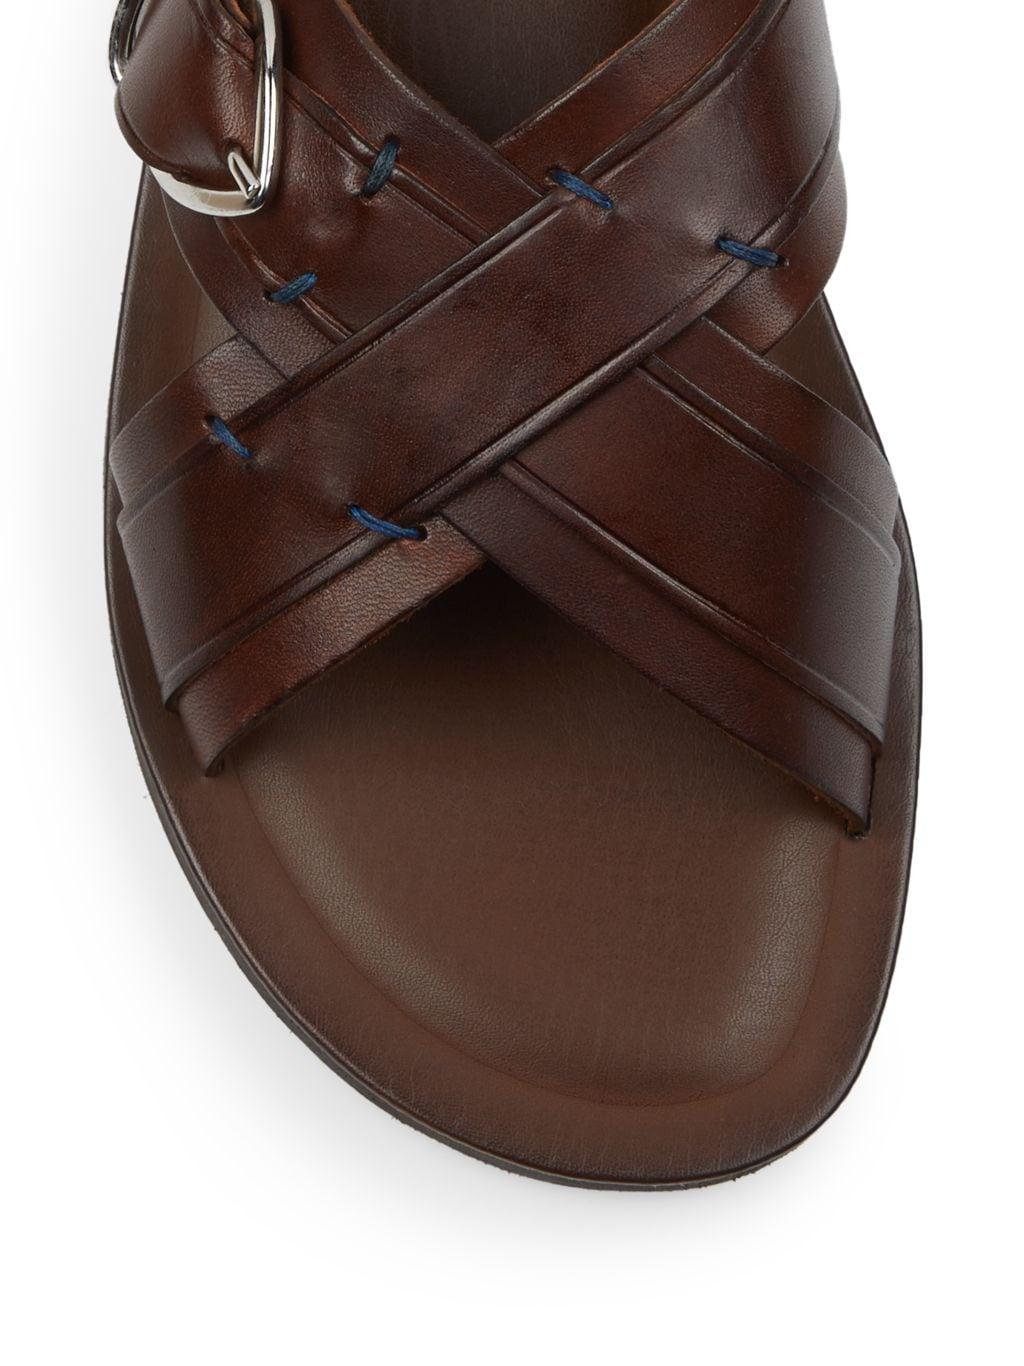 Massimo Matteo Cross Buckle Leather Slide Sandals